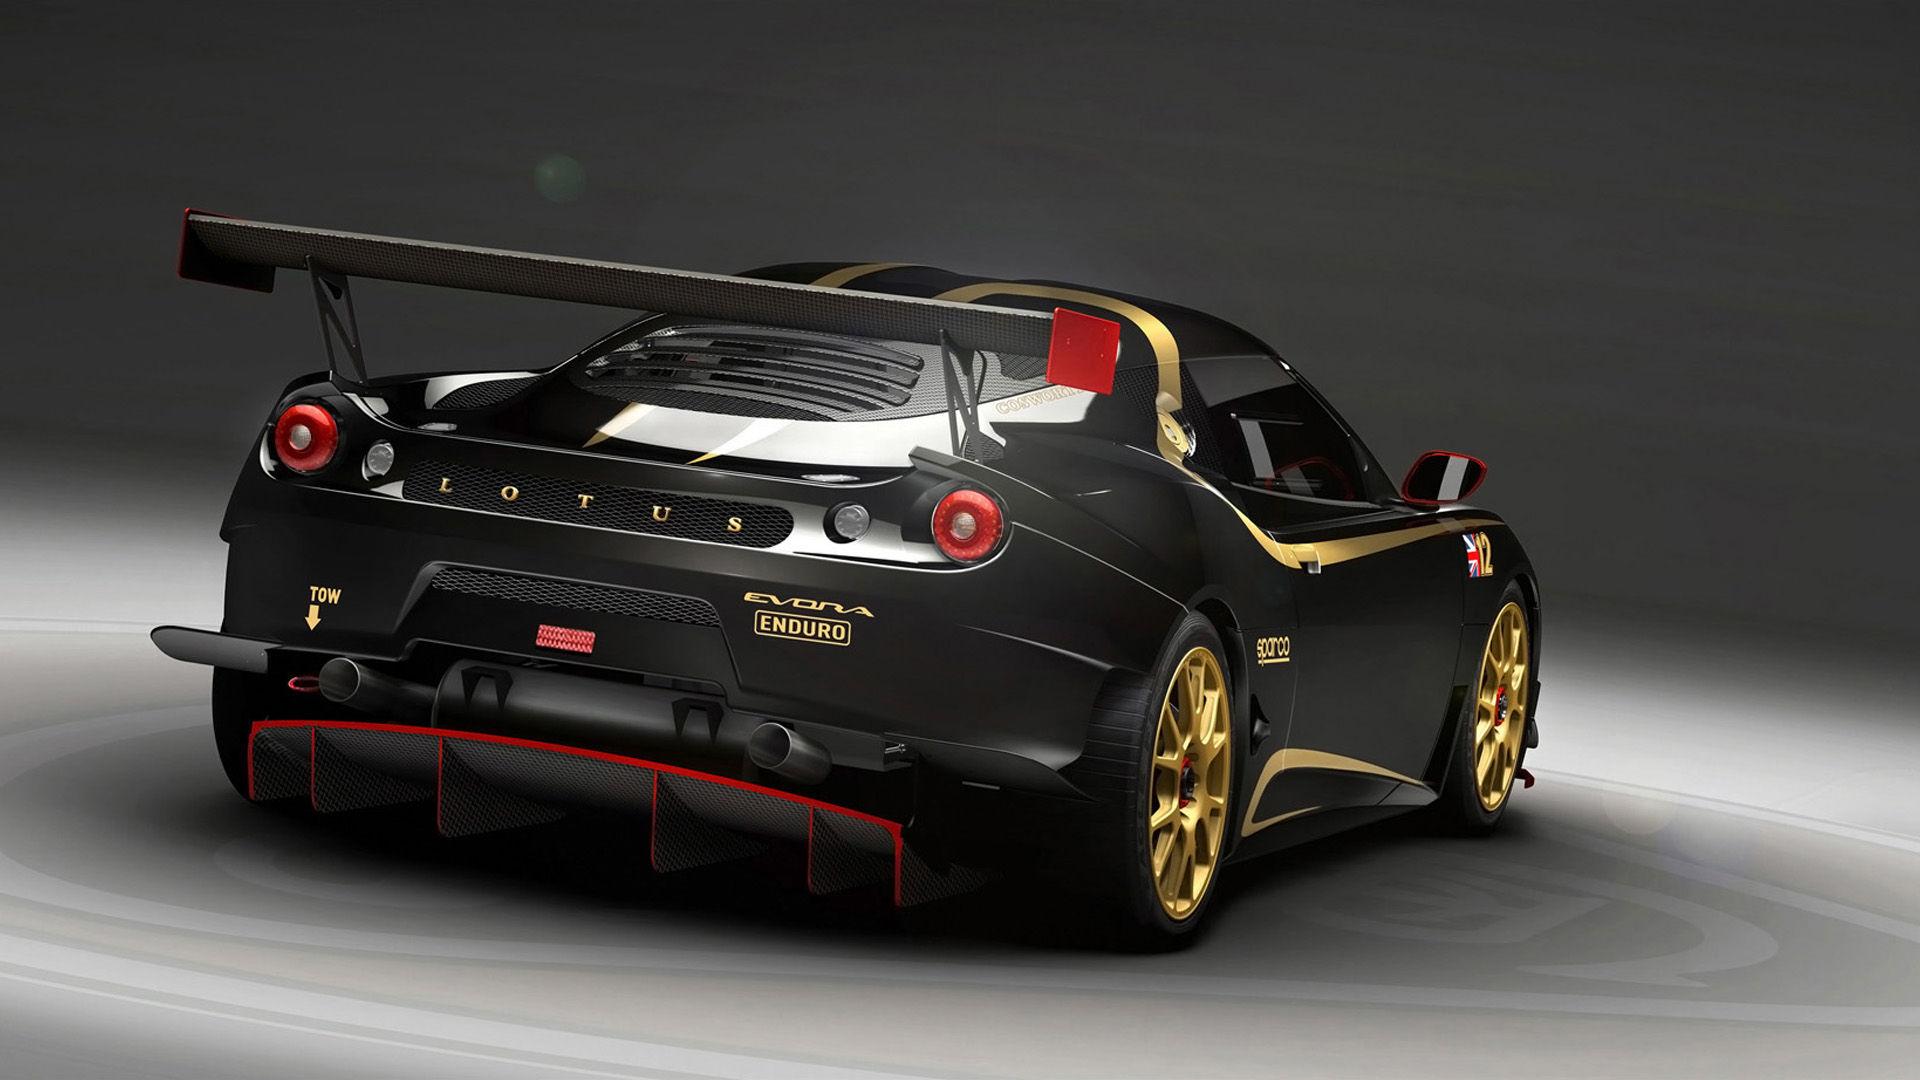 2011 Lotus Evora Endora GT Concept